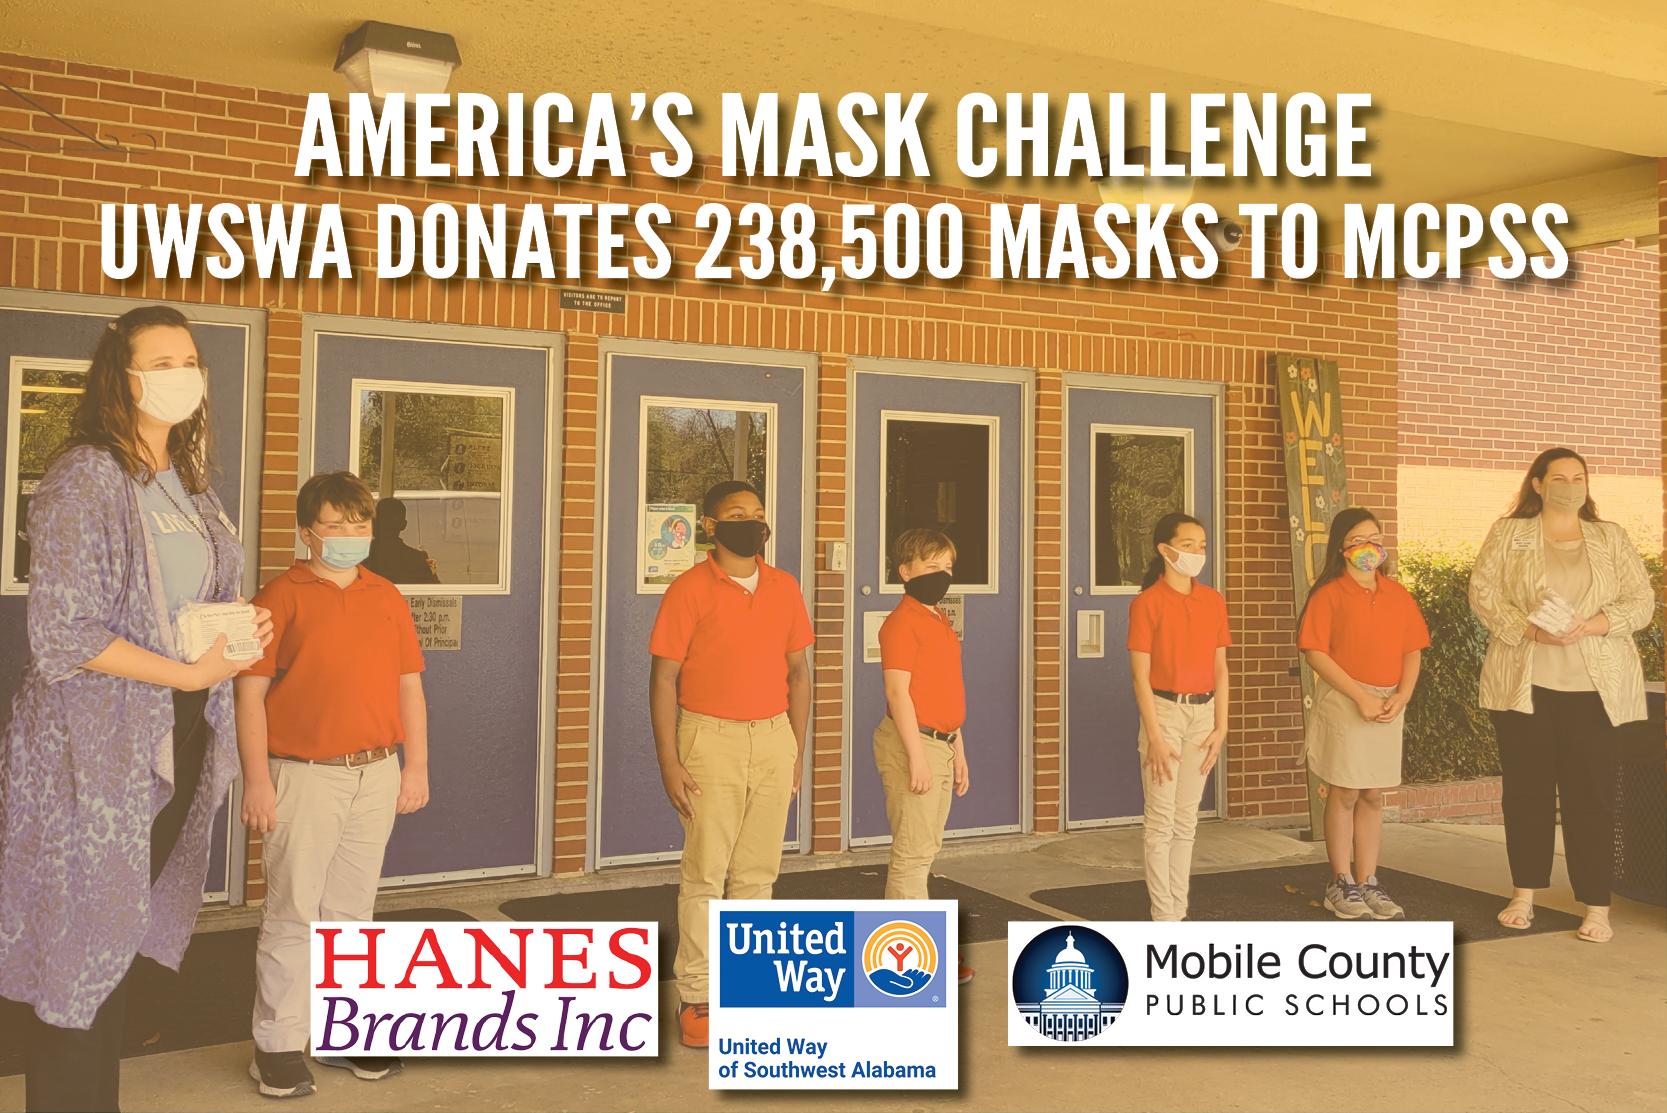 UWSWA donates 238,500 Masks to MCPSS